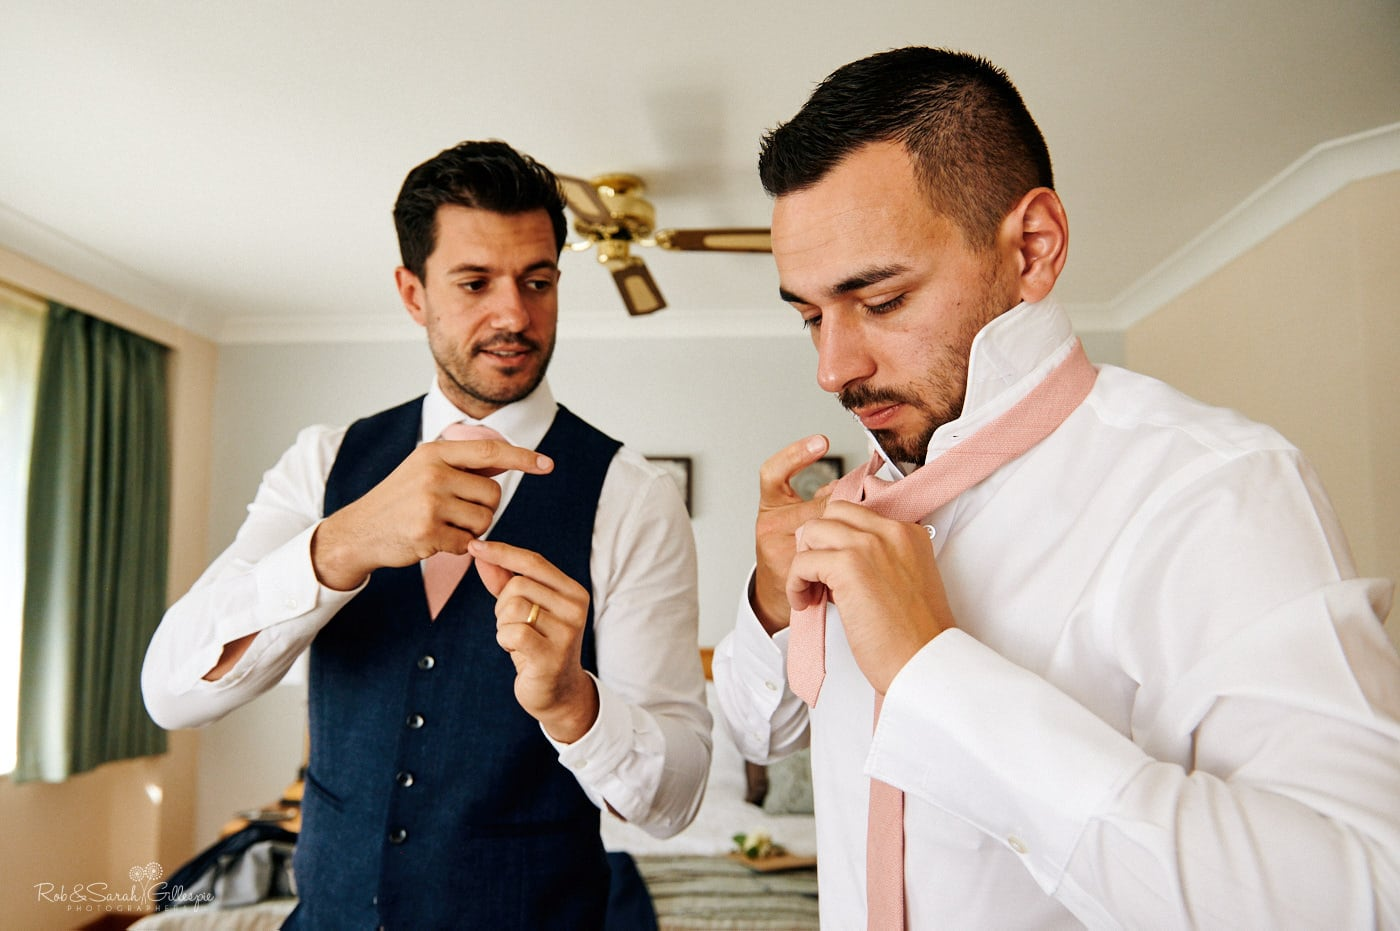 Groom and groomsmen prepare for wedding